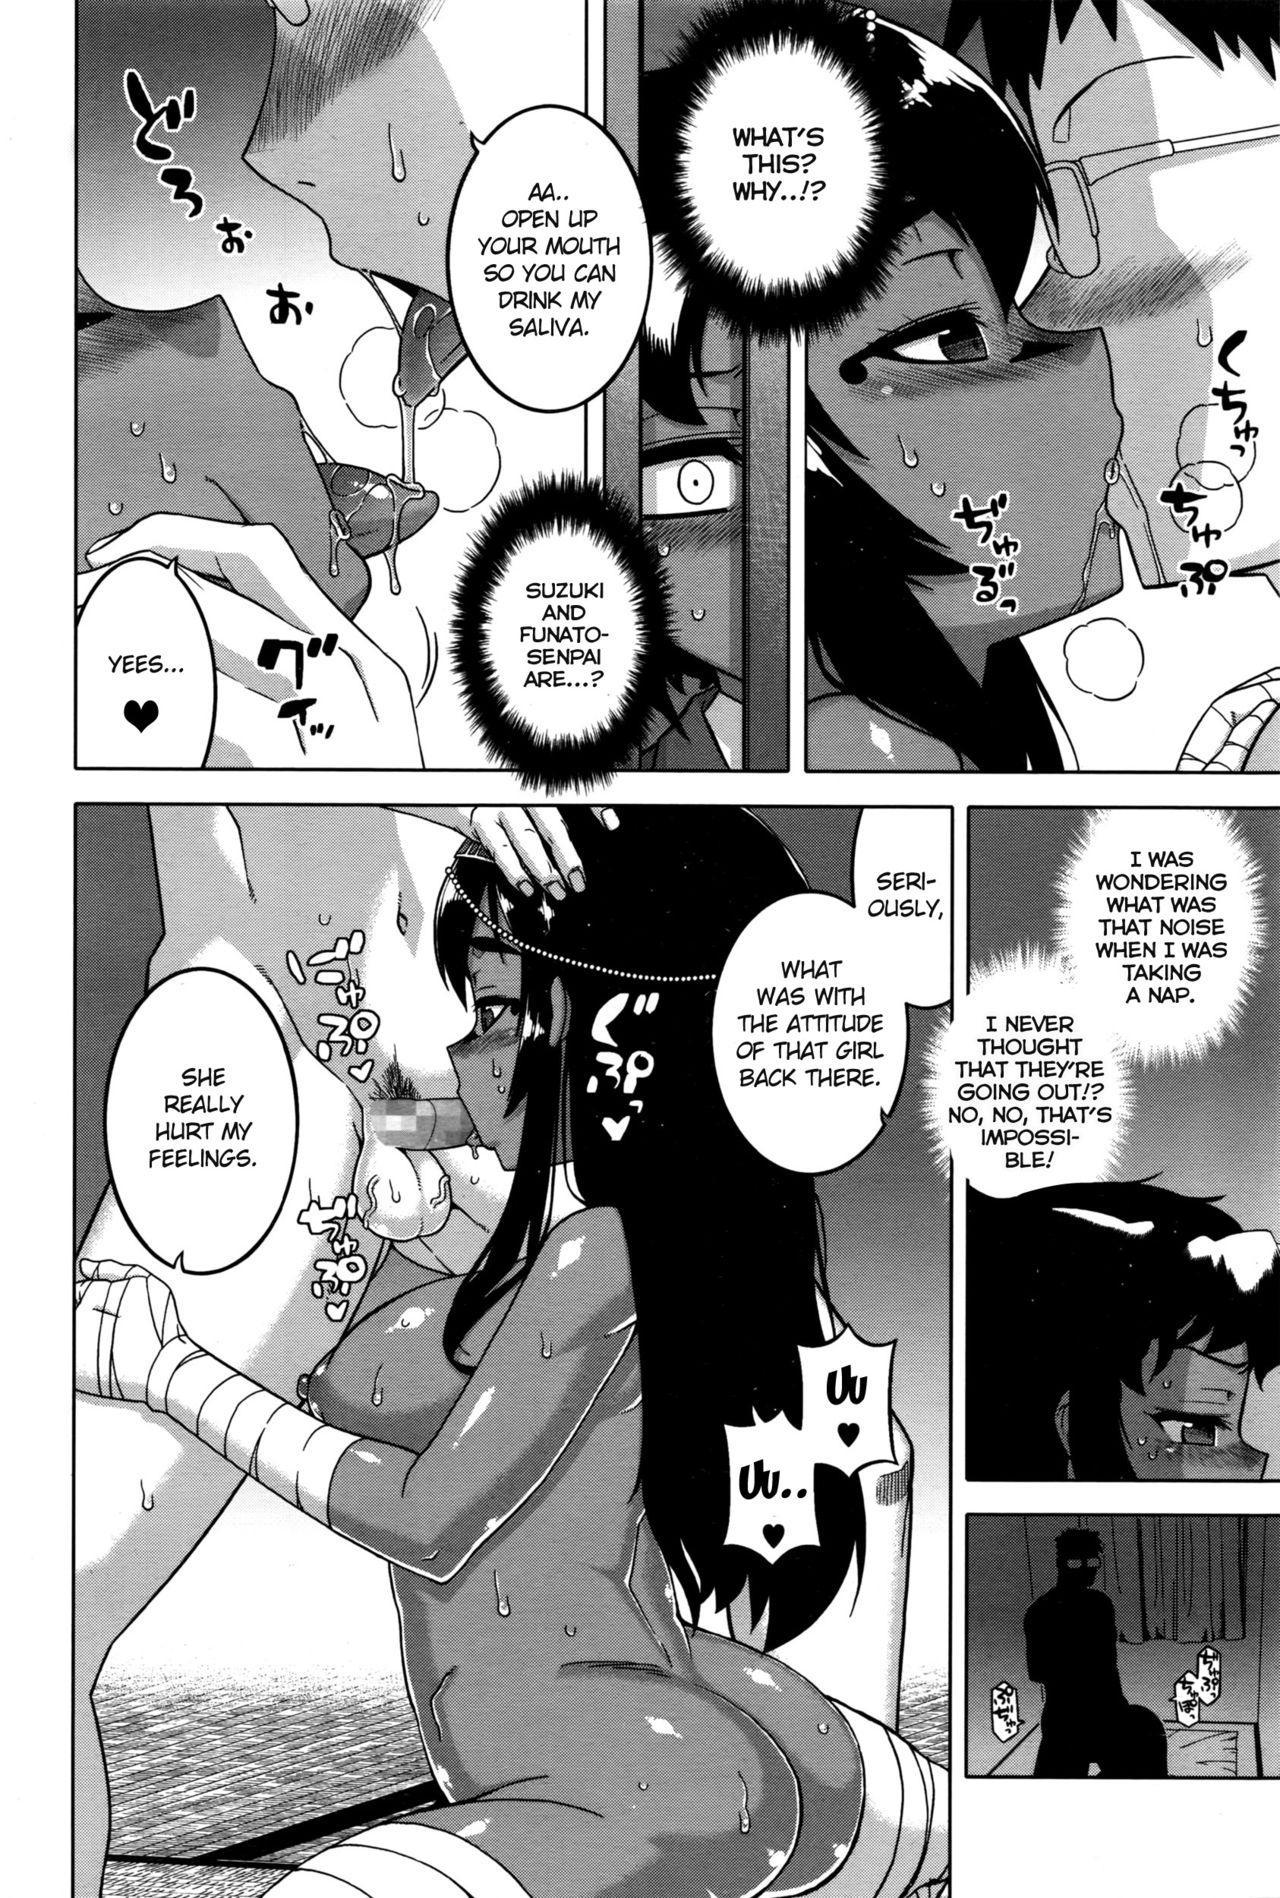 [Takatsu] Masaka Watashi no Pharaoh!?   Impossible, My Master (Pharaoh) is !? (COMIC Megastore Alpha 2016-11) [English] [mgsj123] 1